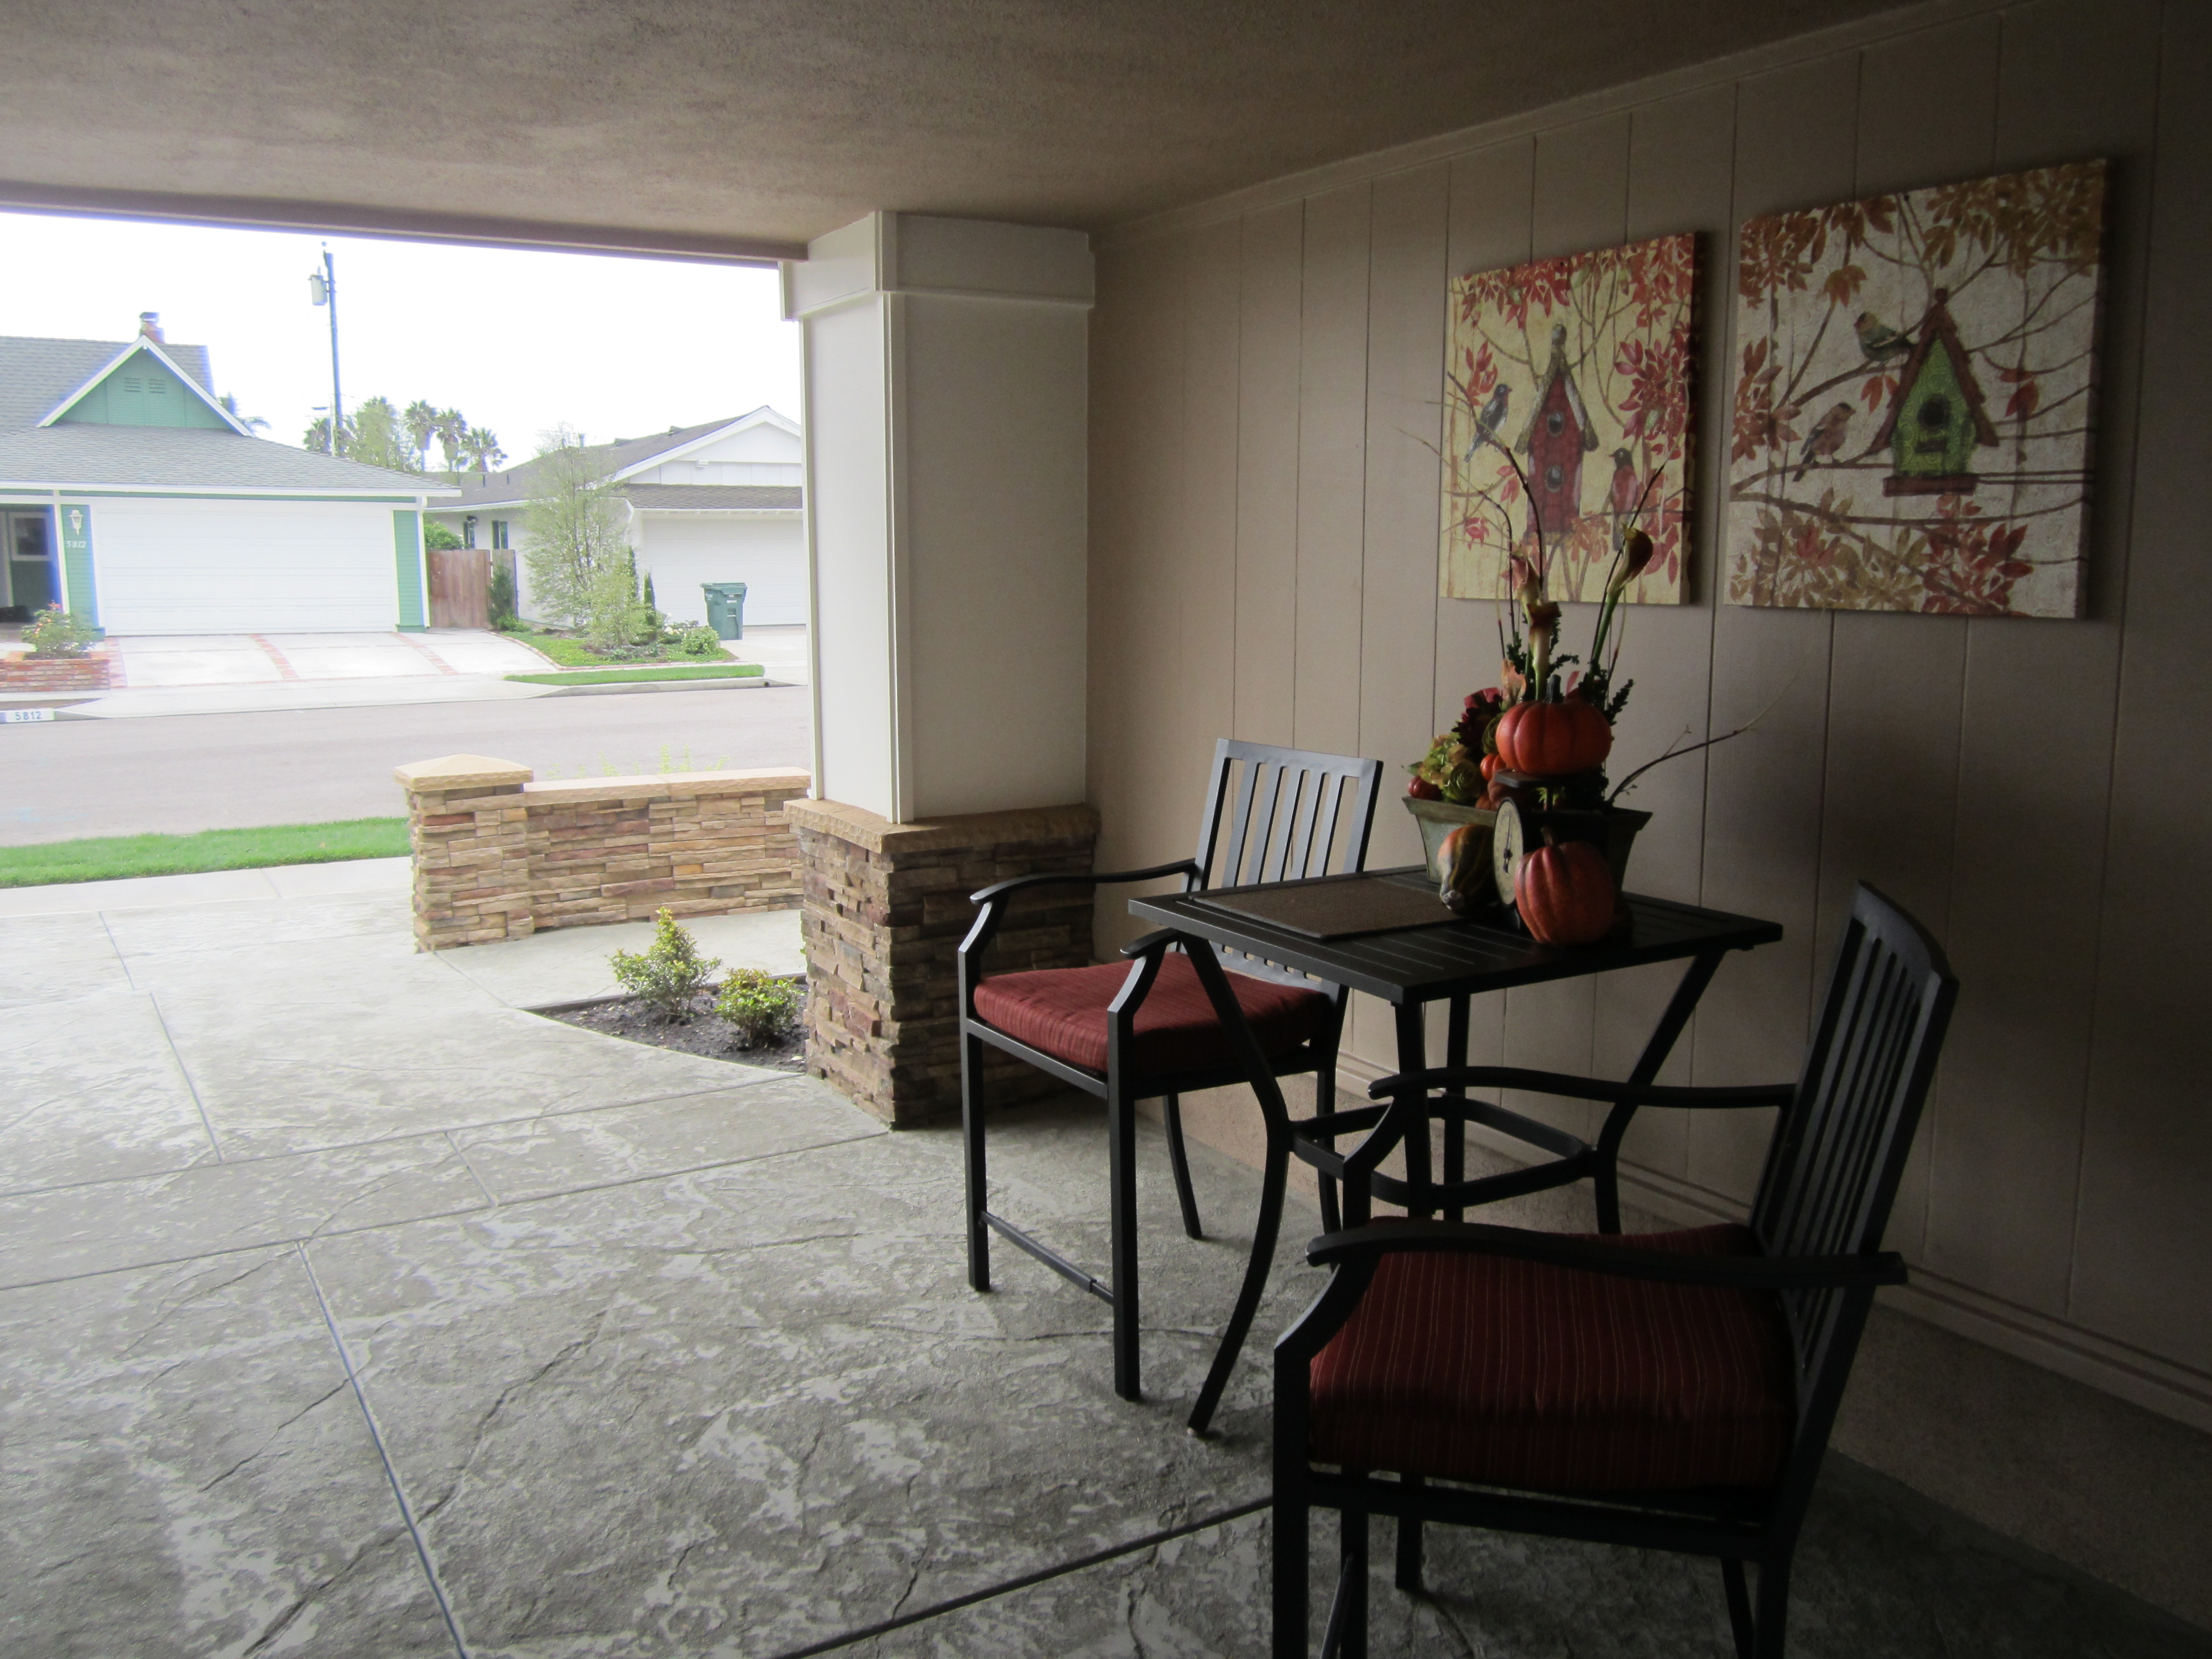 Porch off the Entrance